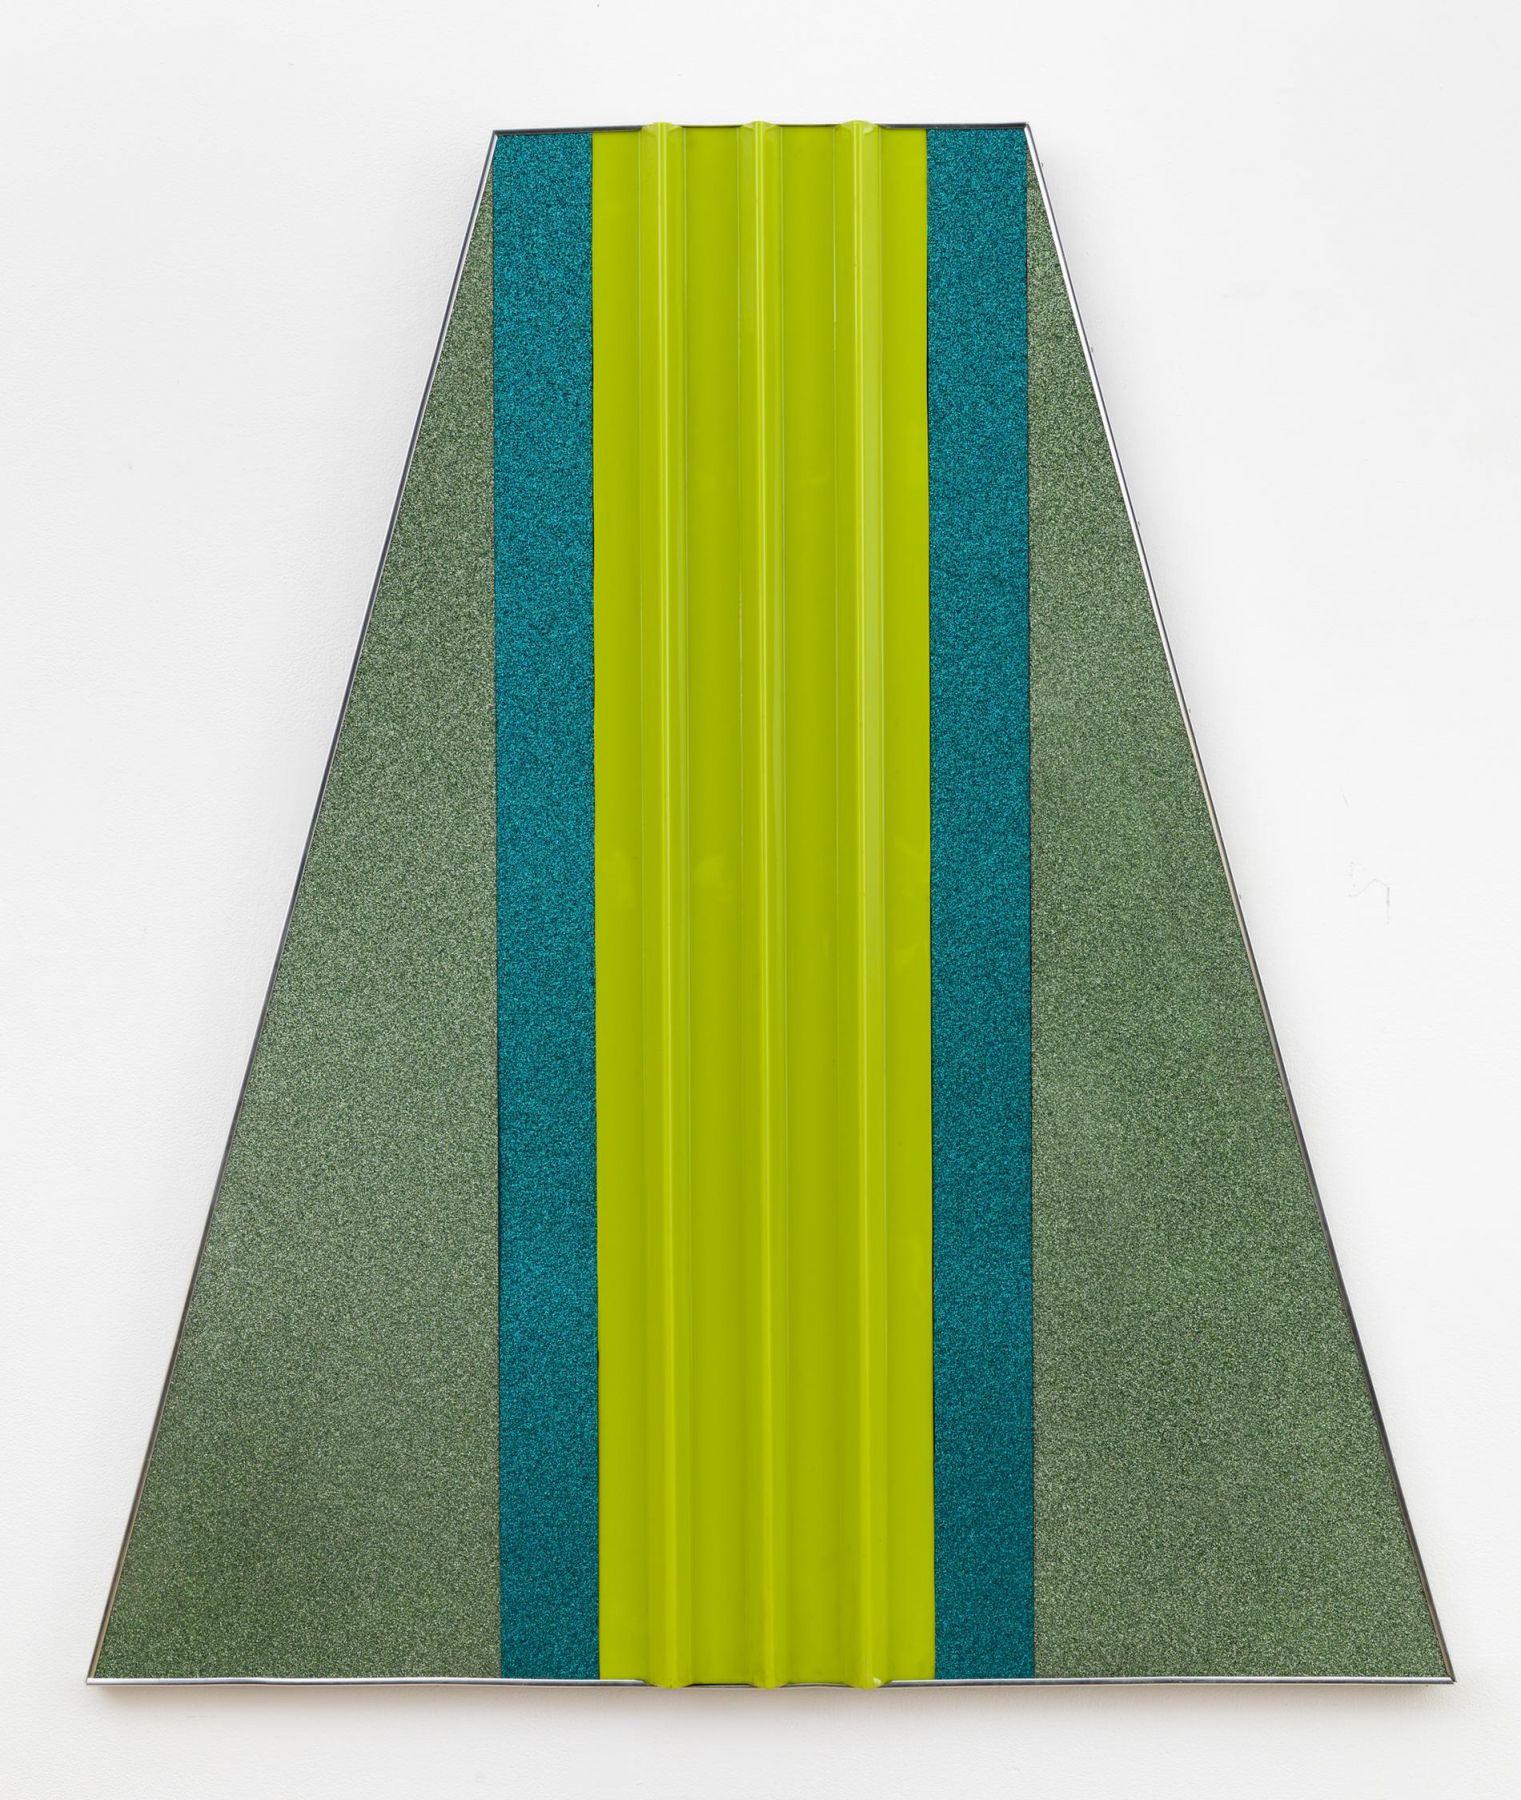 , ROBERT SMITHSON,Fling, 1965,Green plastic panels on wood, aluminum stripping, 48 x 42 in.